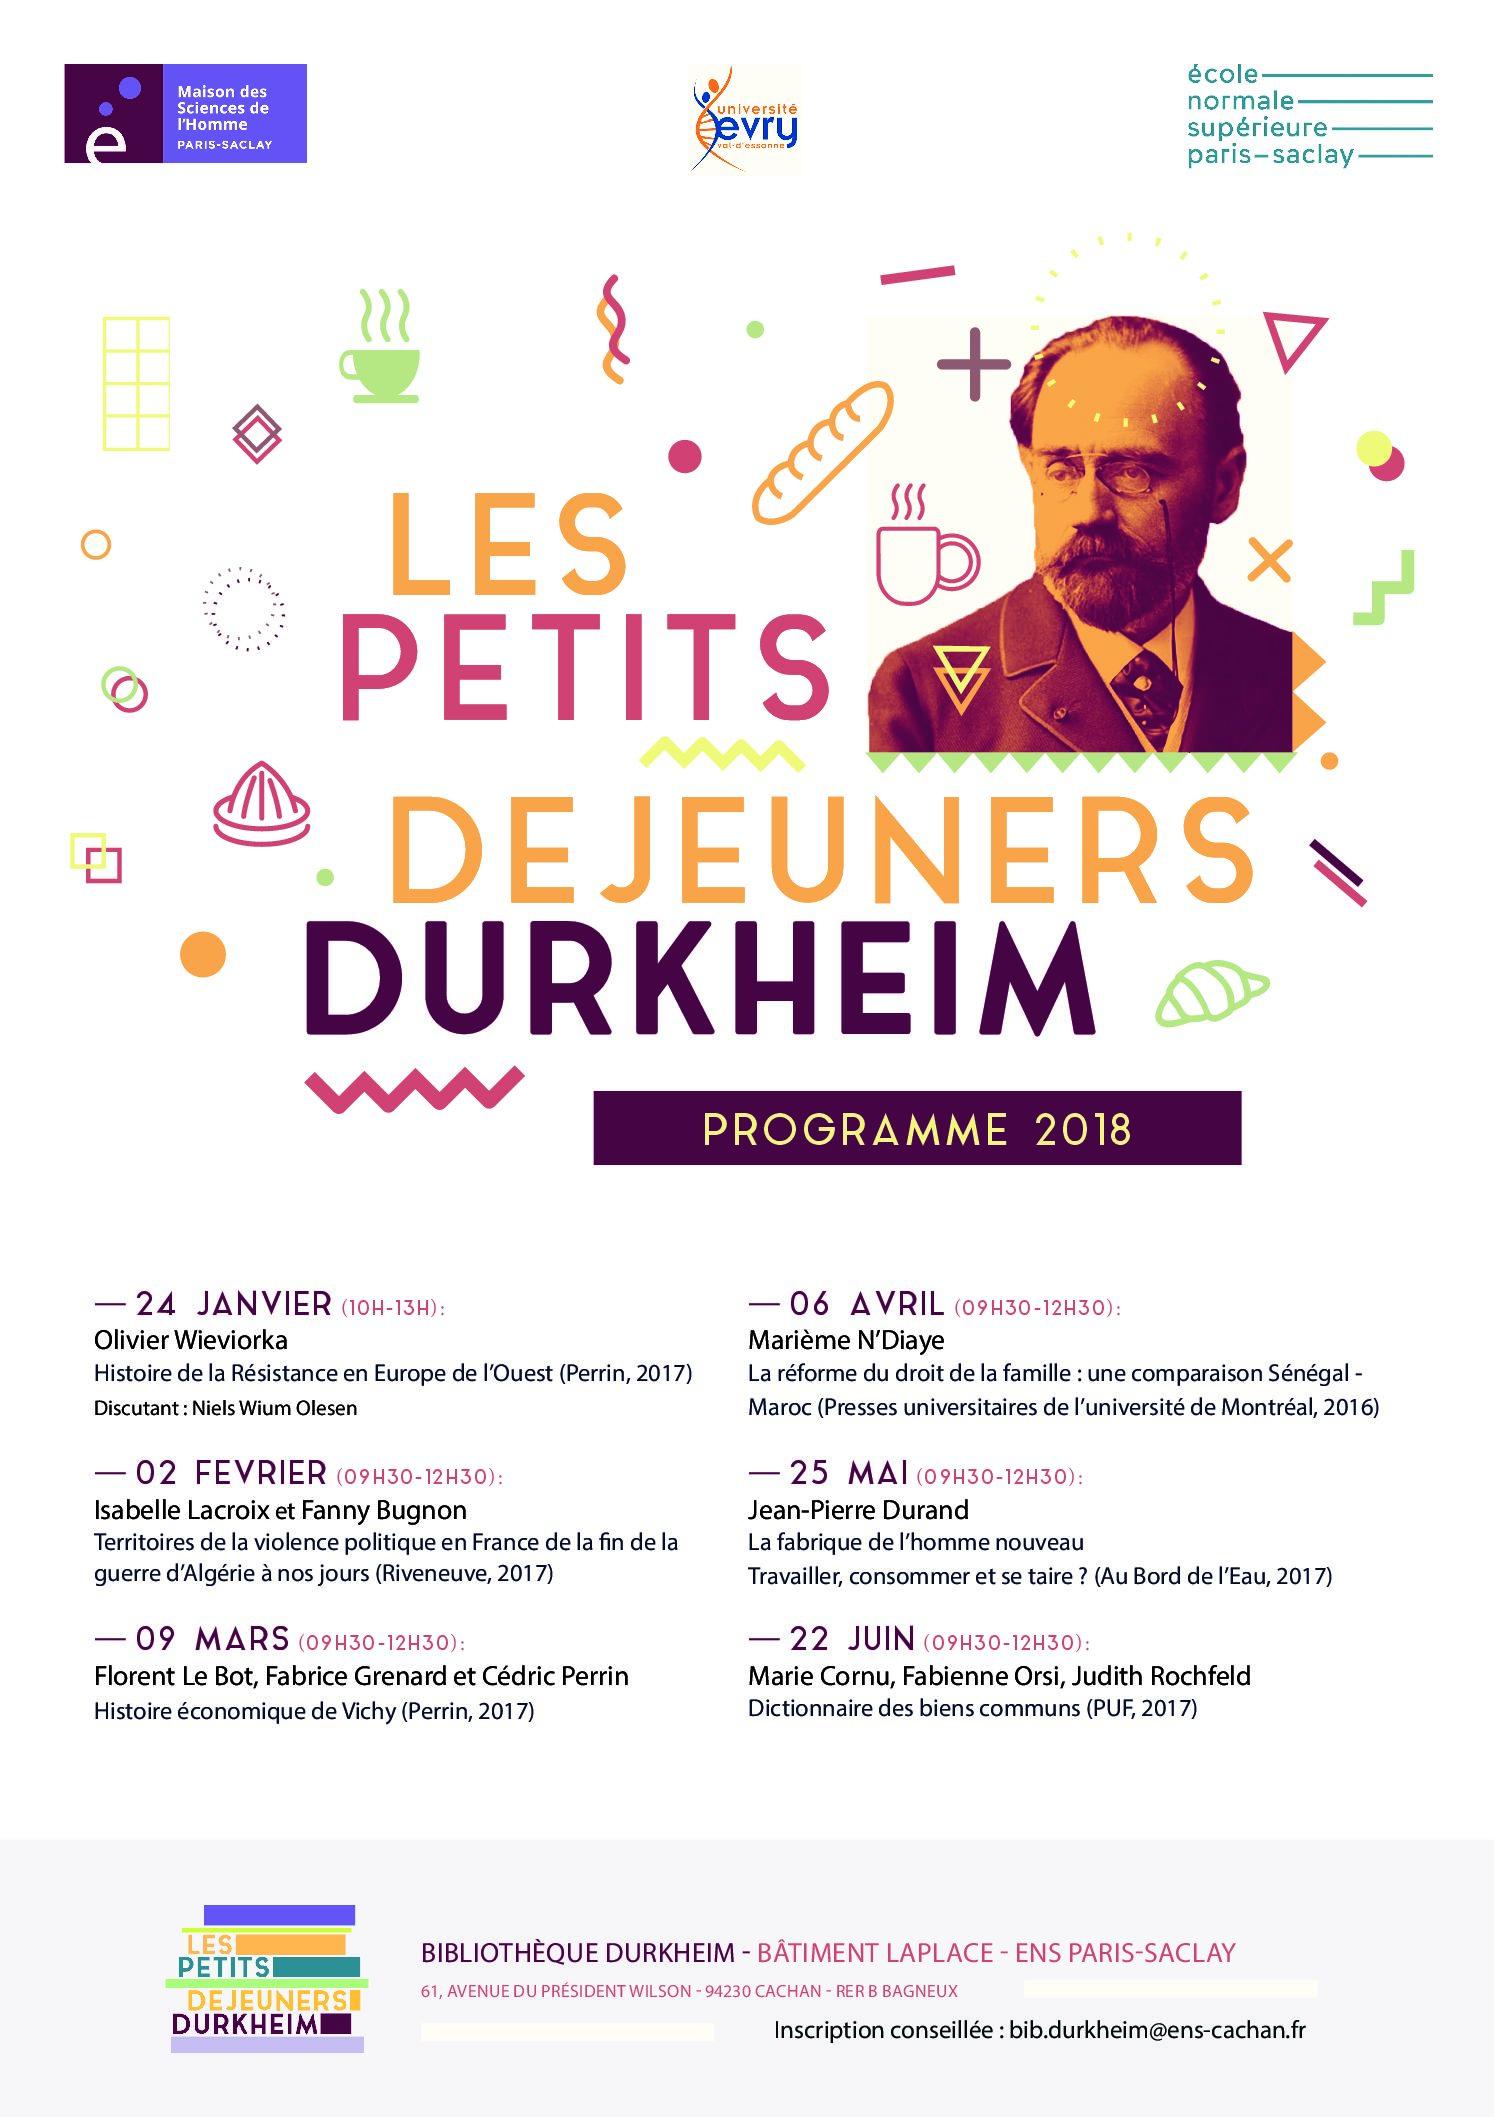 Les Petits Déjeuners Durkheim 2018